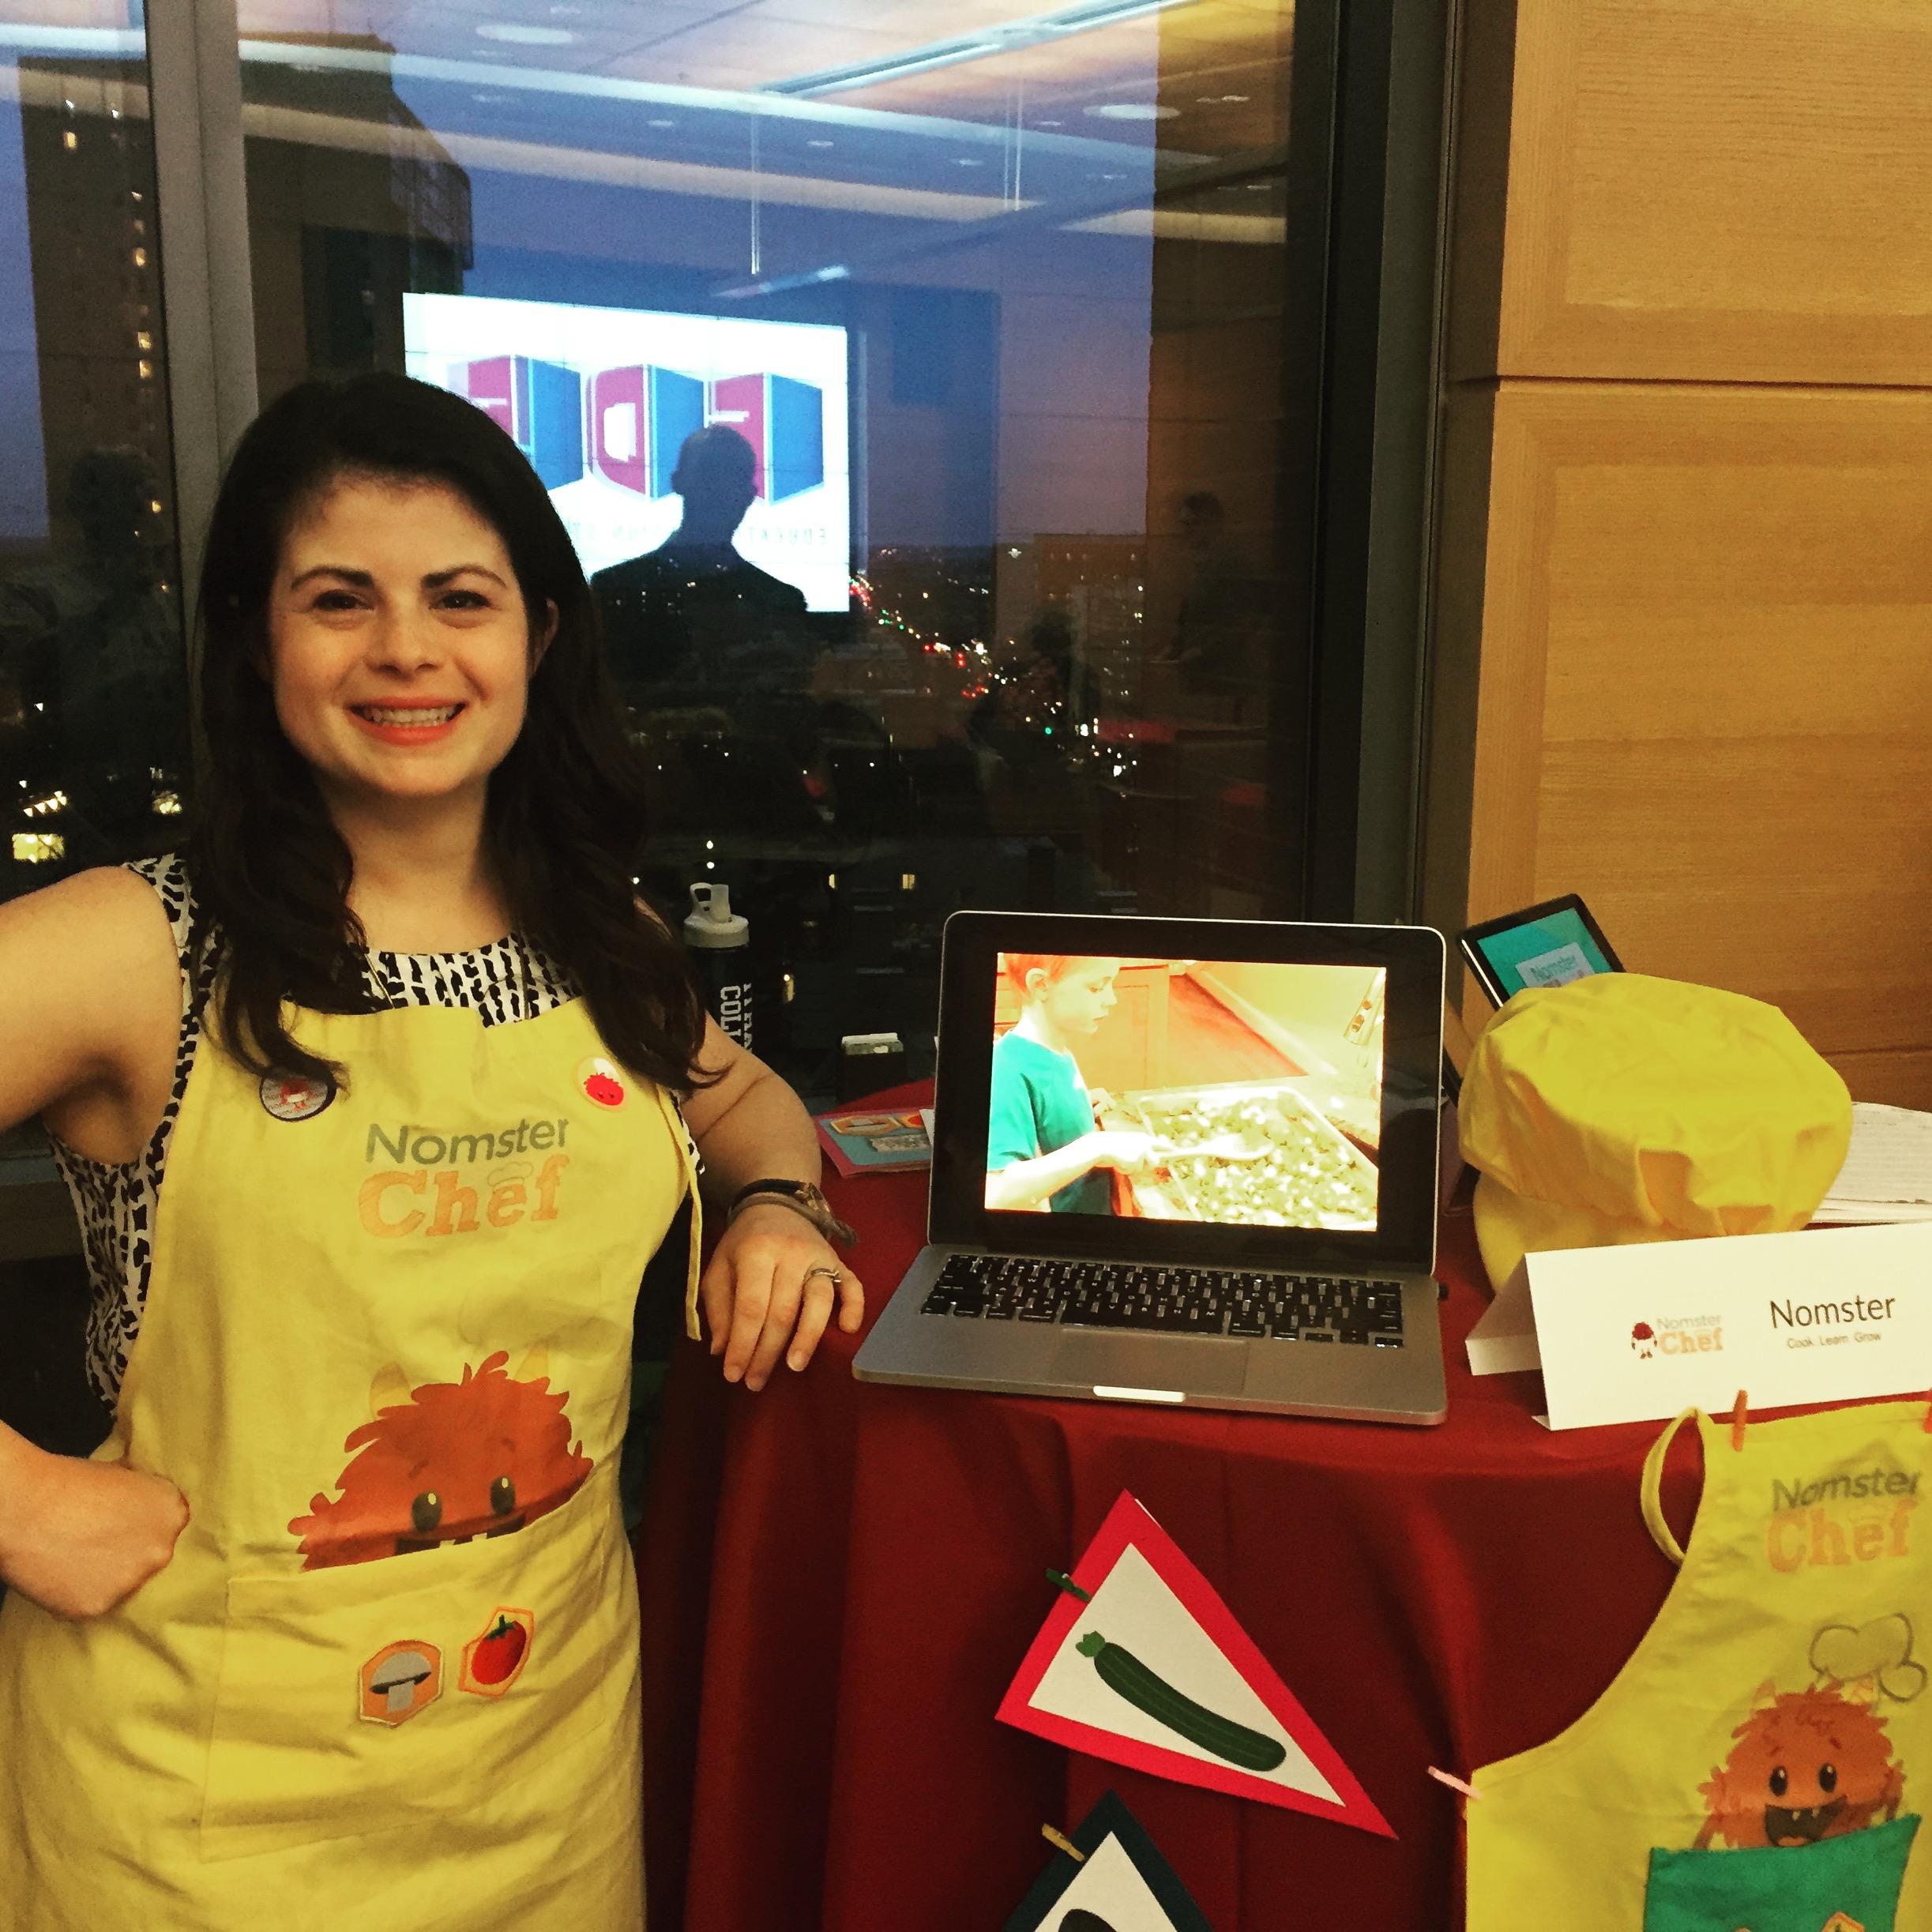 Ashley-Moulton-Nomster-Chef